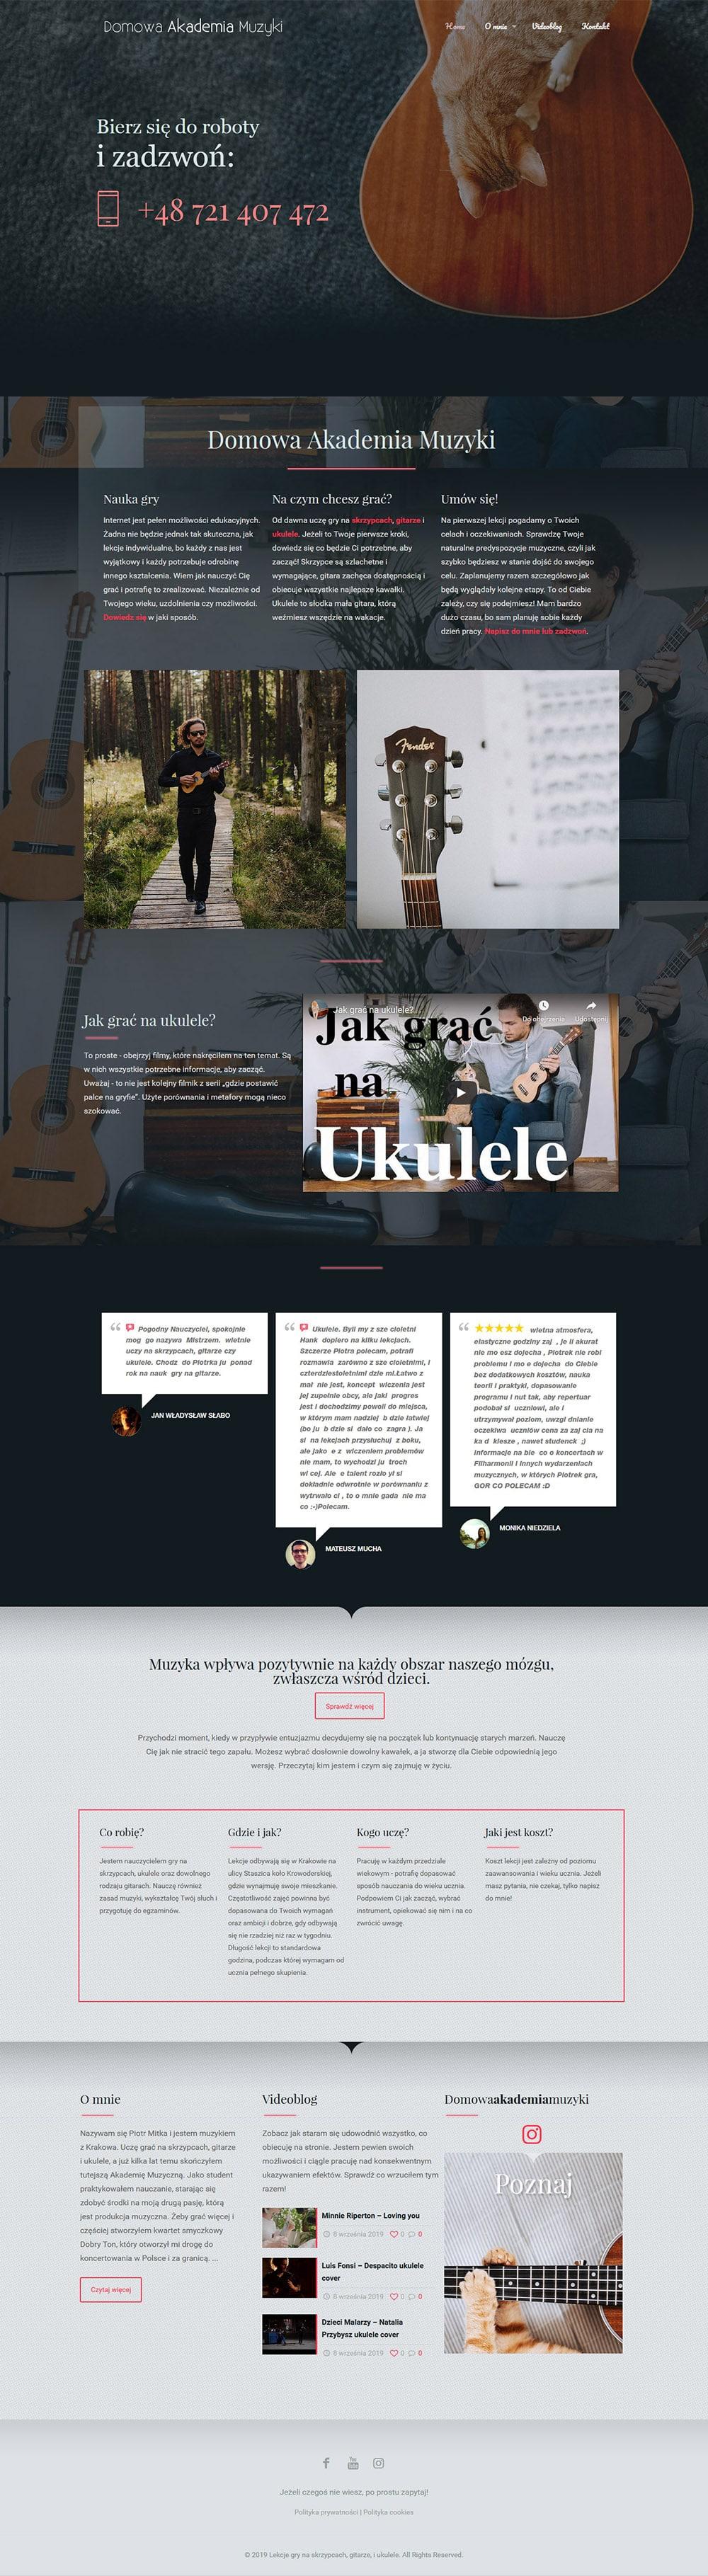 akademia-muzyki-web